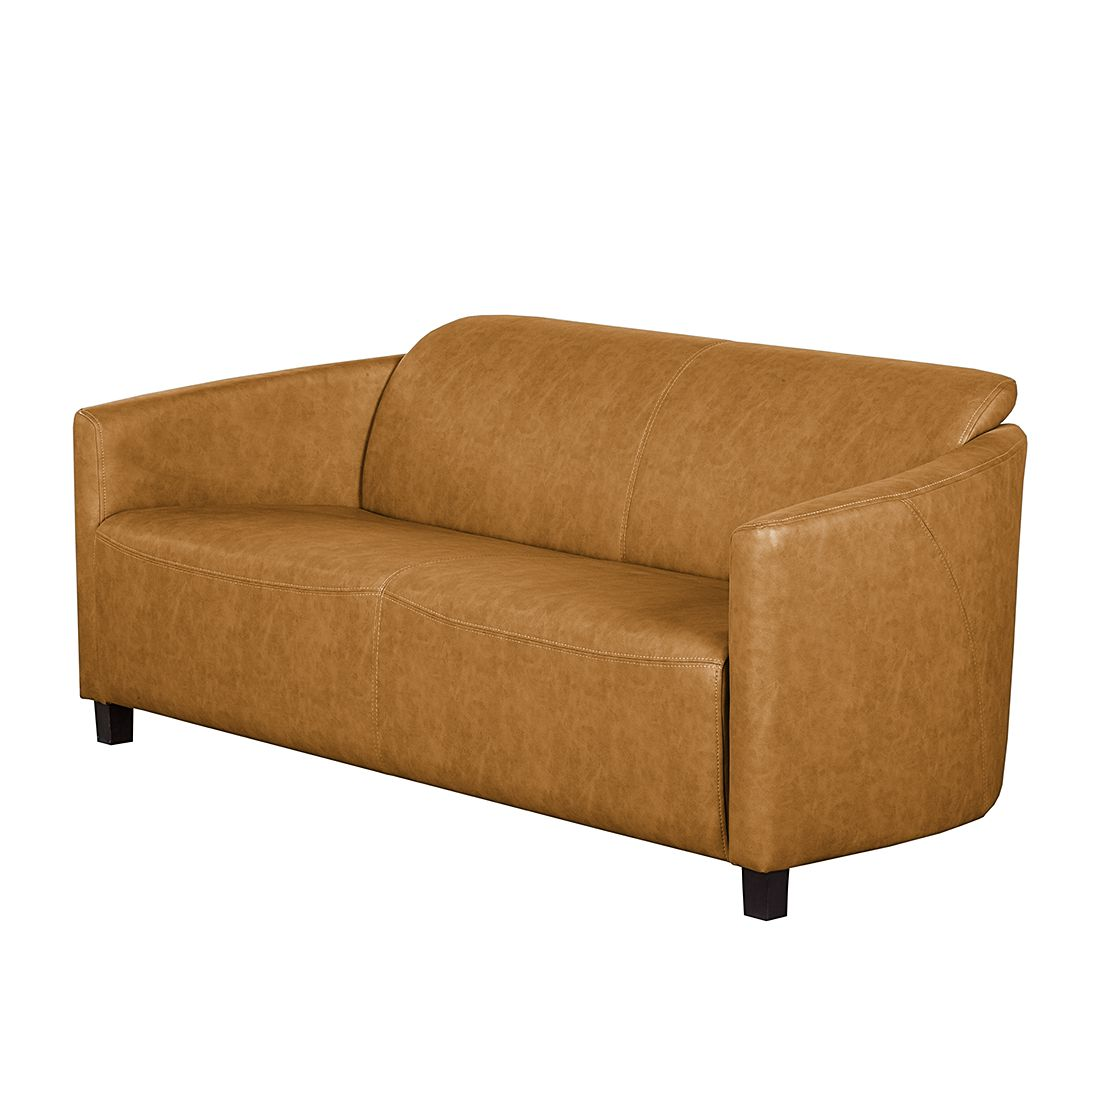 sofa jill 2 sitzer kunstleder stoff wei grau pictures to pin on pinterest. Black Bedroom Furniture Sets. Home Design Ideas